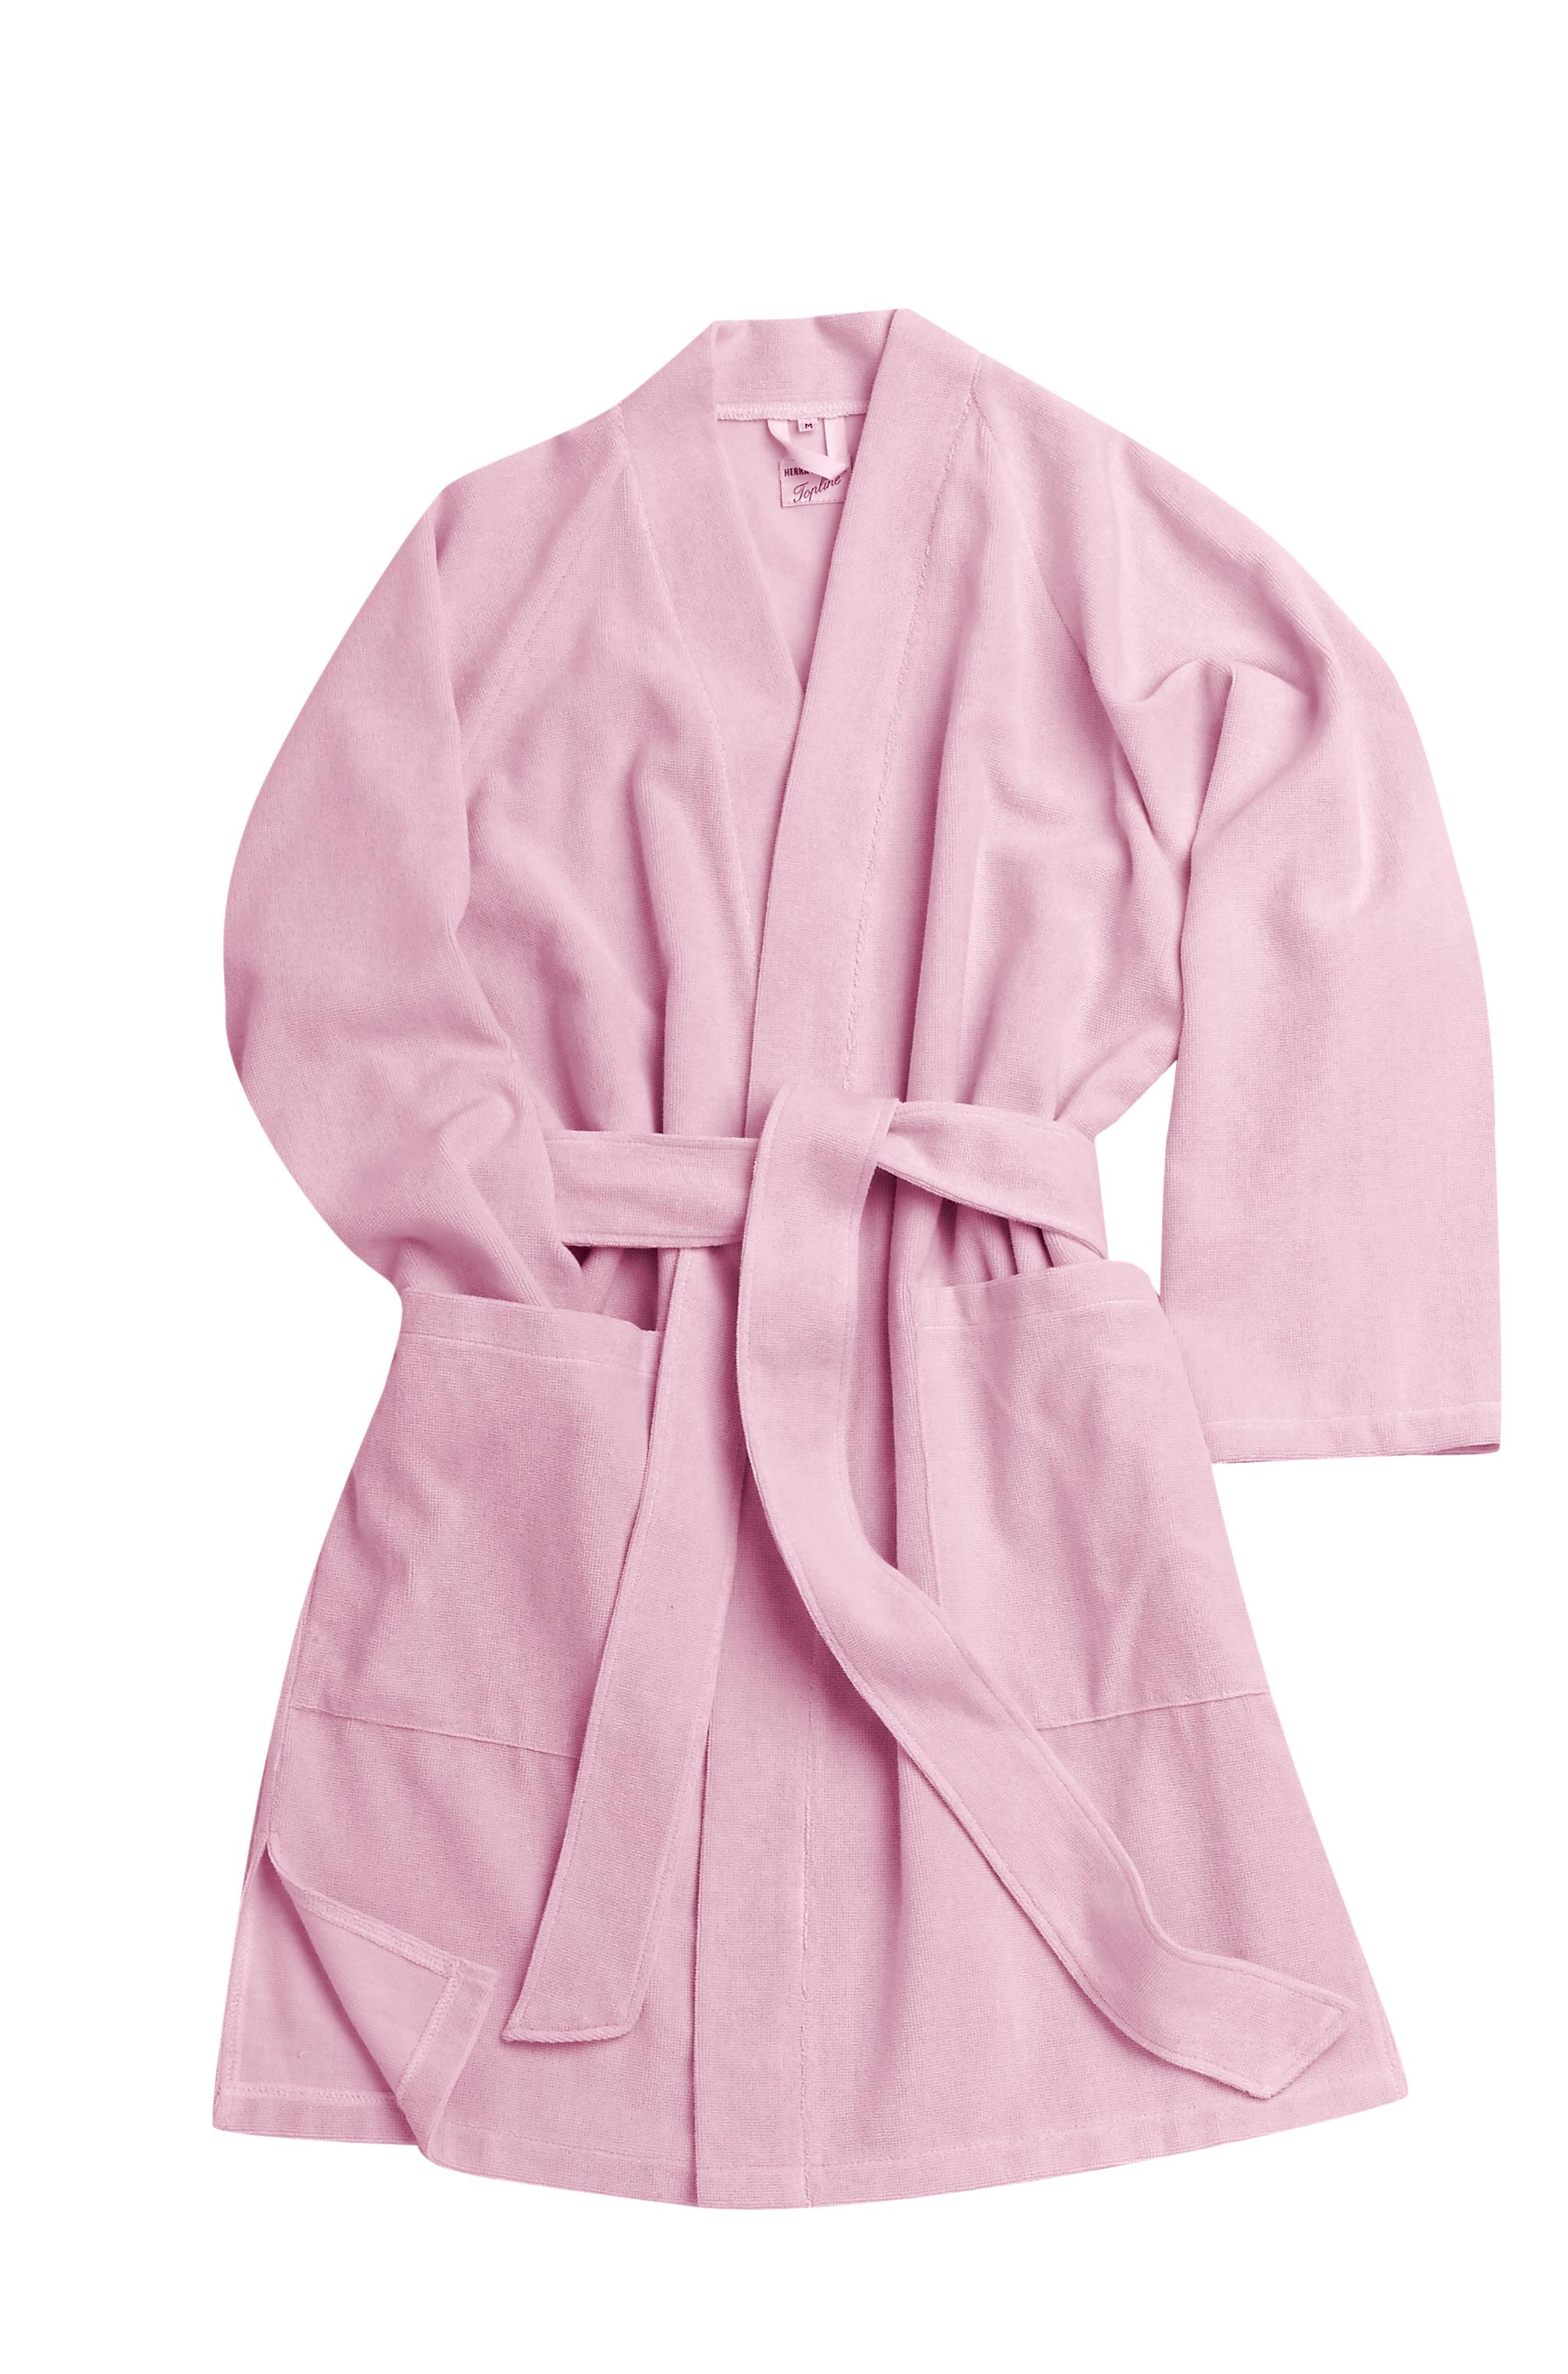 f3c4da2afefd89 light-kimono-kurz-bademantel-herka-frottier-terry-towel-